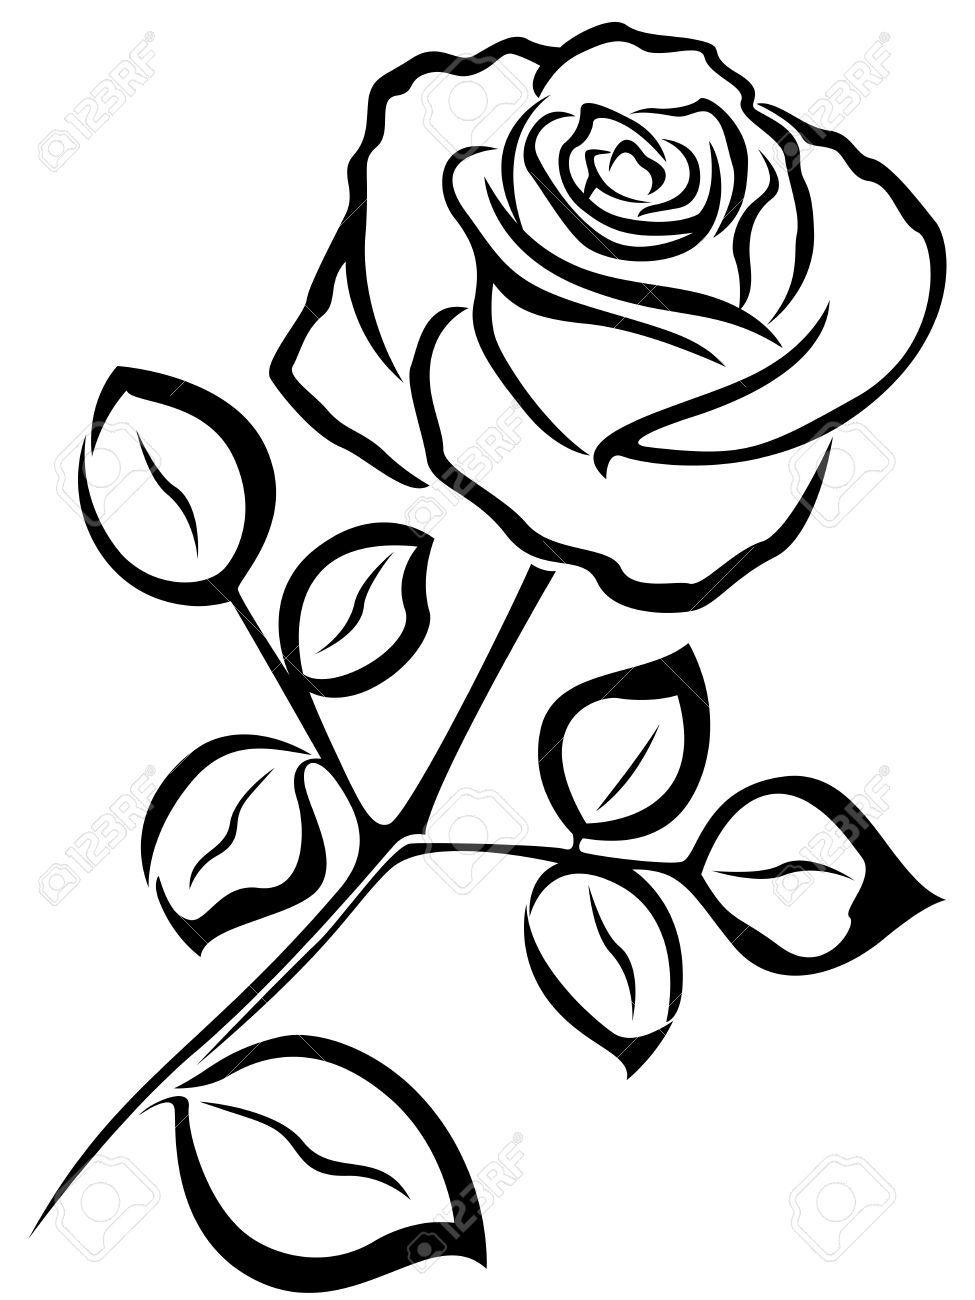 41824880Blackvectoroutlineofsingleroseflower